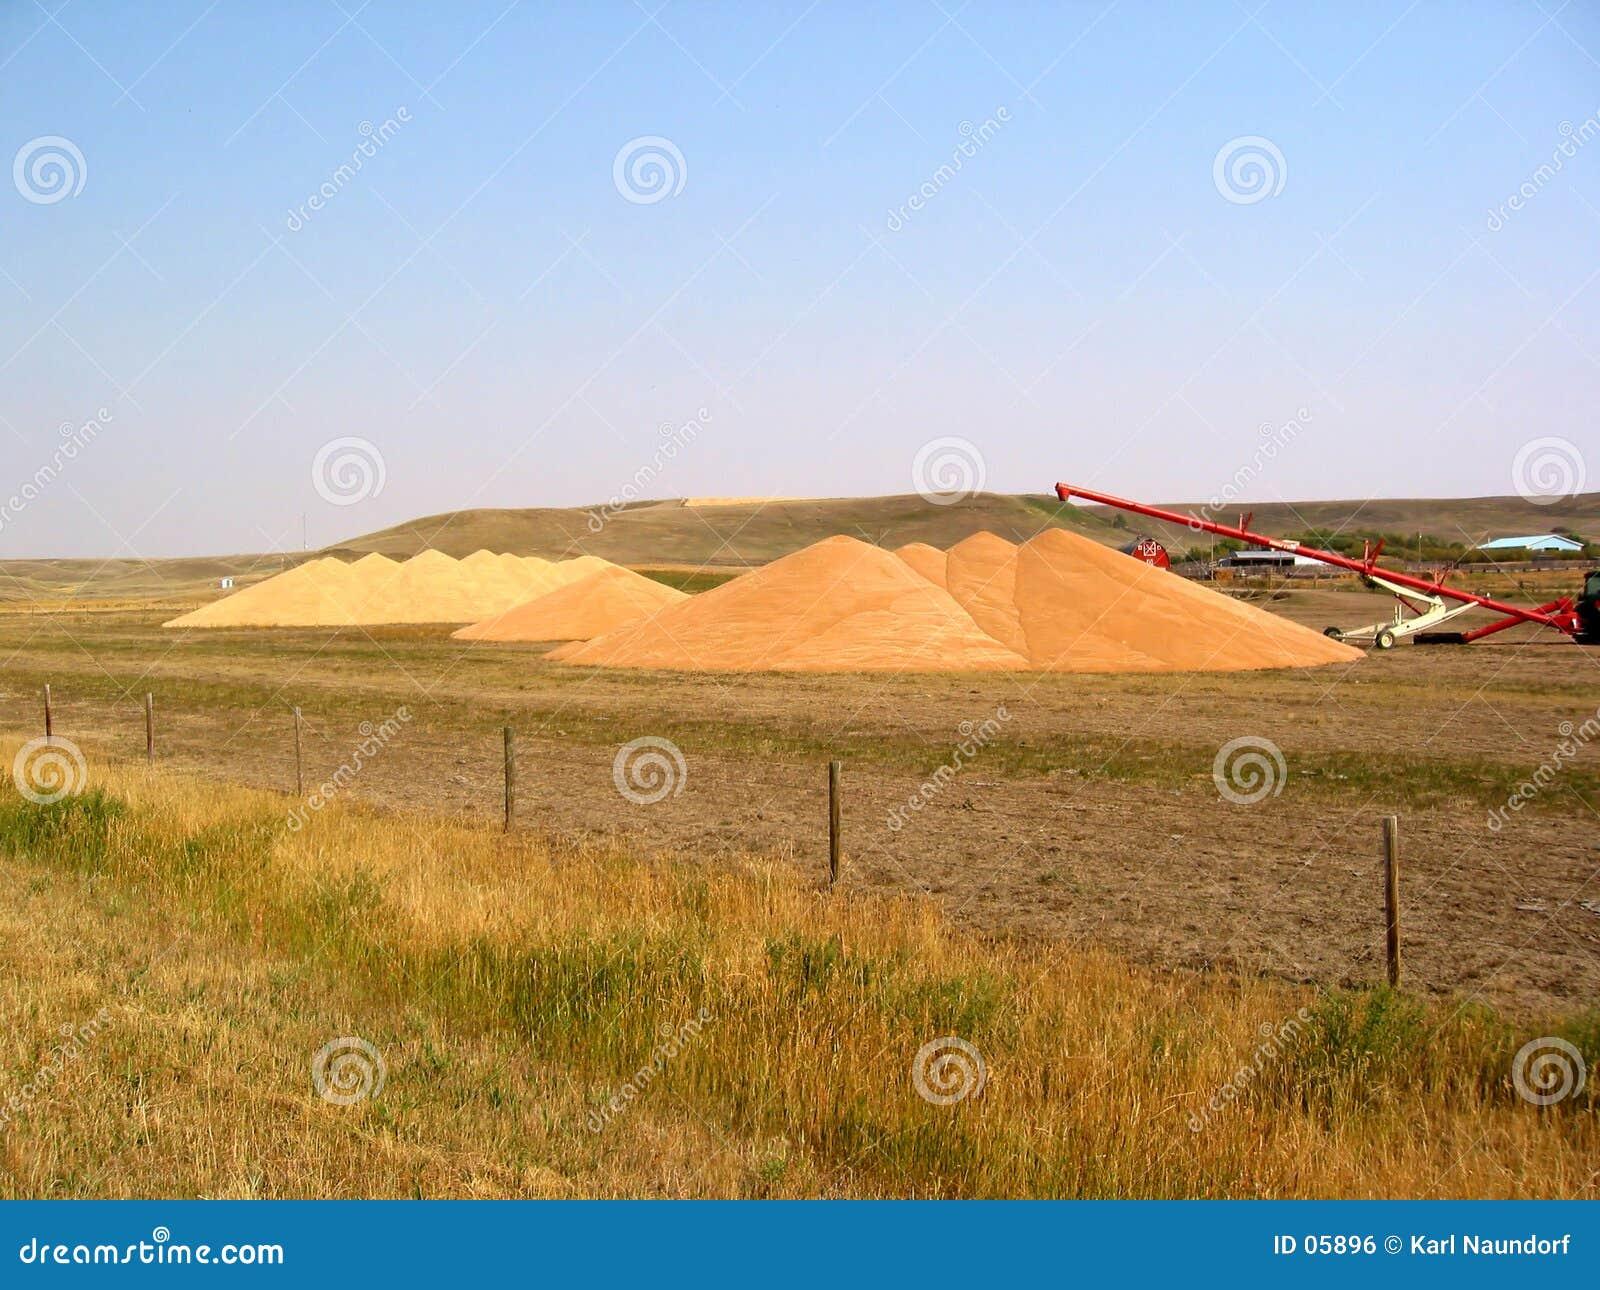 Grain Piles